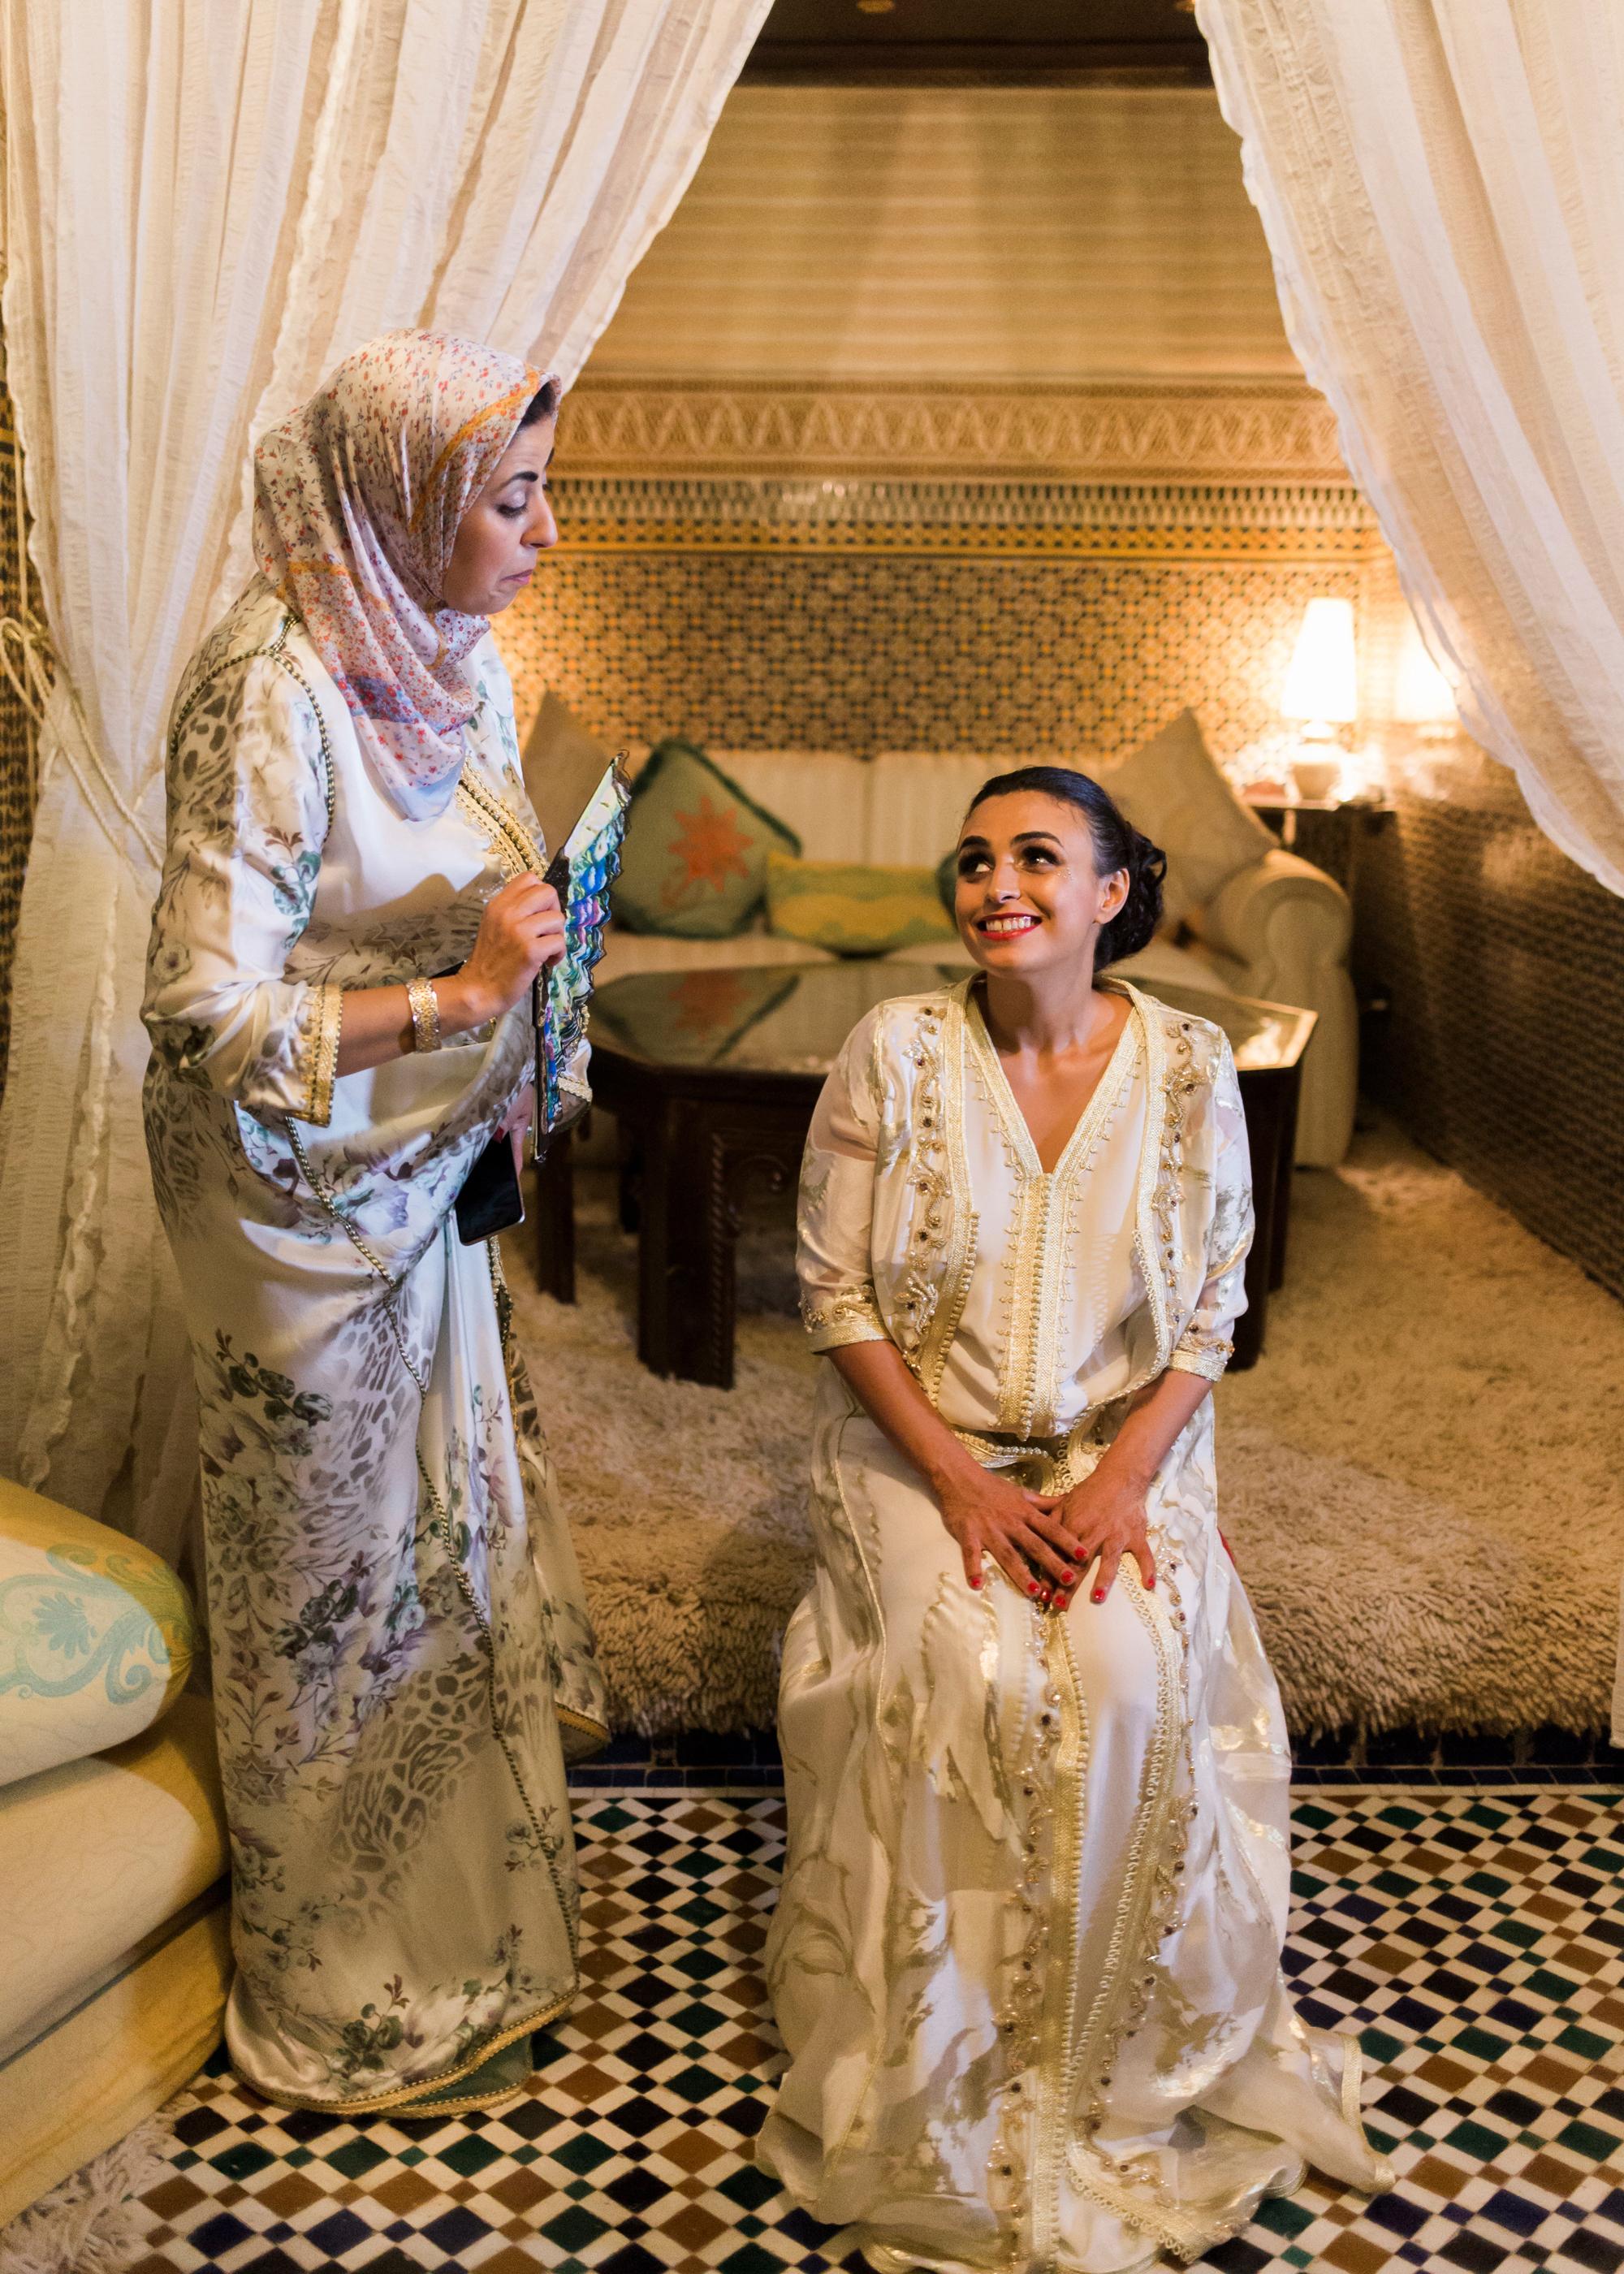 marrakech-morocco-destination-wedding-lilouette-19.jpg